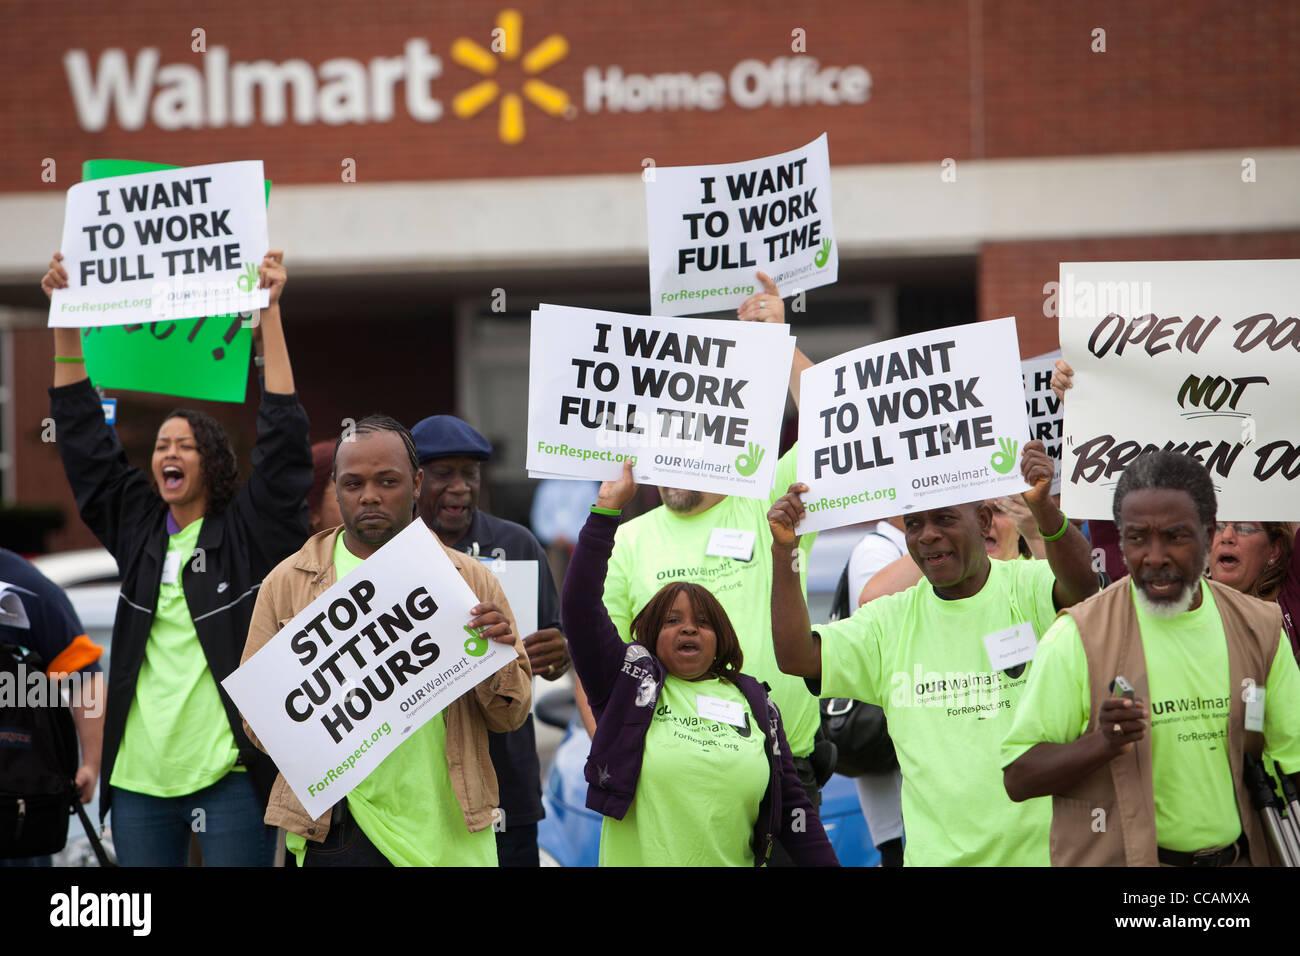 Walmart Mitarbeiter demonstrieren vor dem Walmart Home Office in Bentonville, Arkansas Stockbild